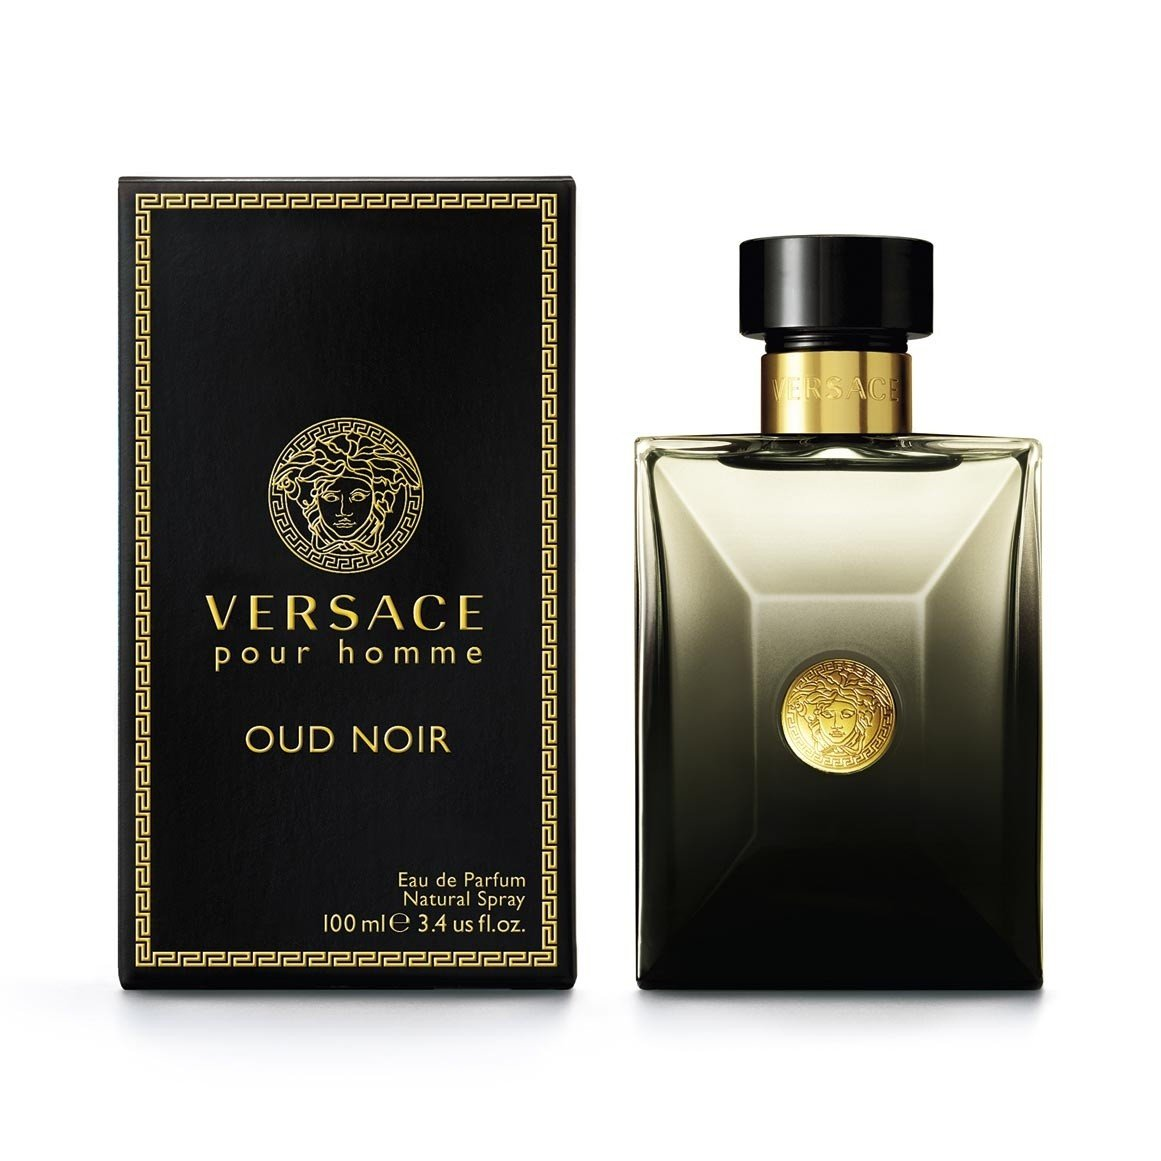 Versace OUD Noir Eau De Parfum Spray, 3.4 Ounce PerfumeWorldWide Inc. Drop Ship VER720210